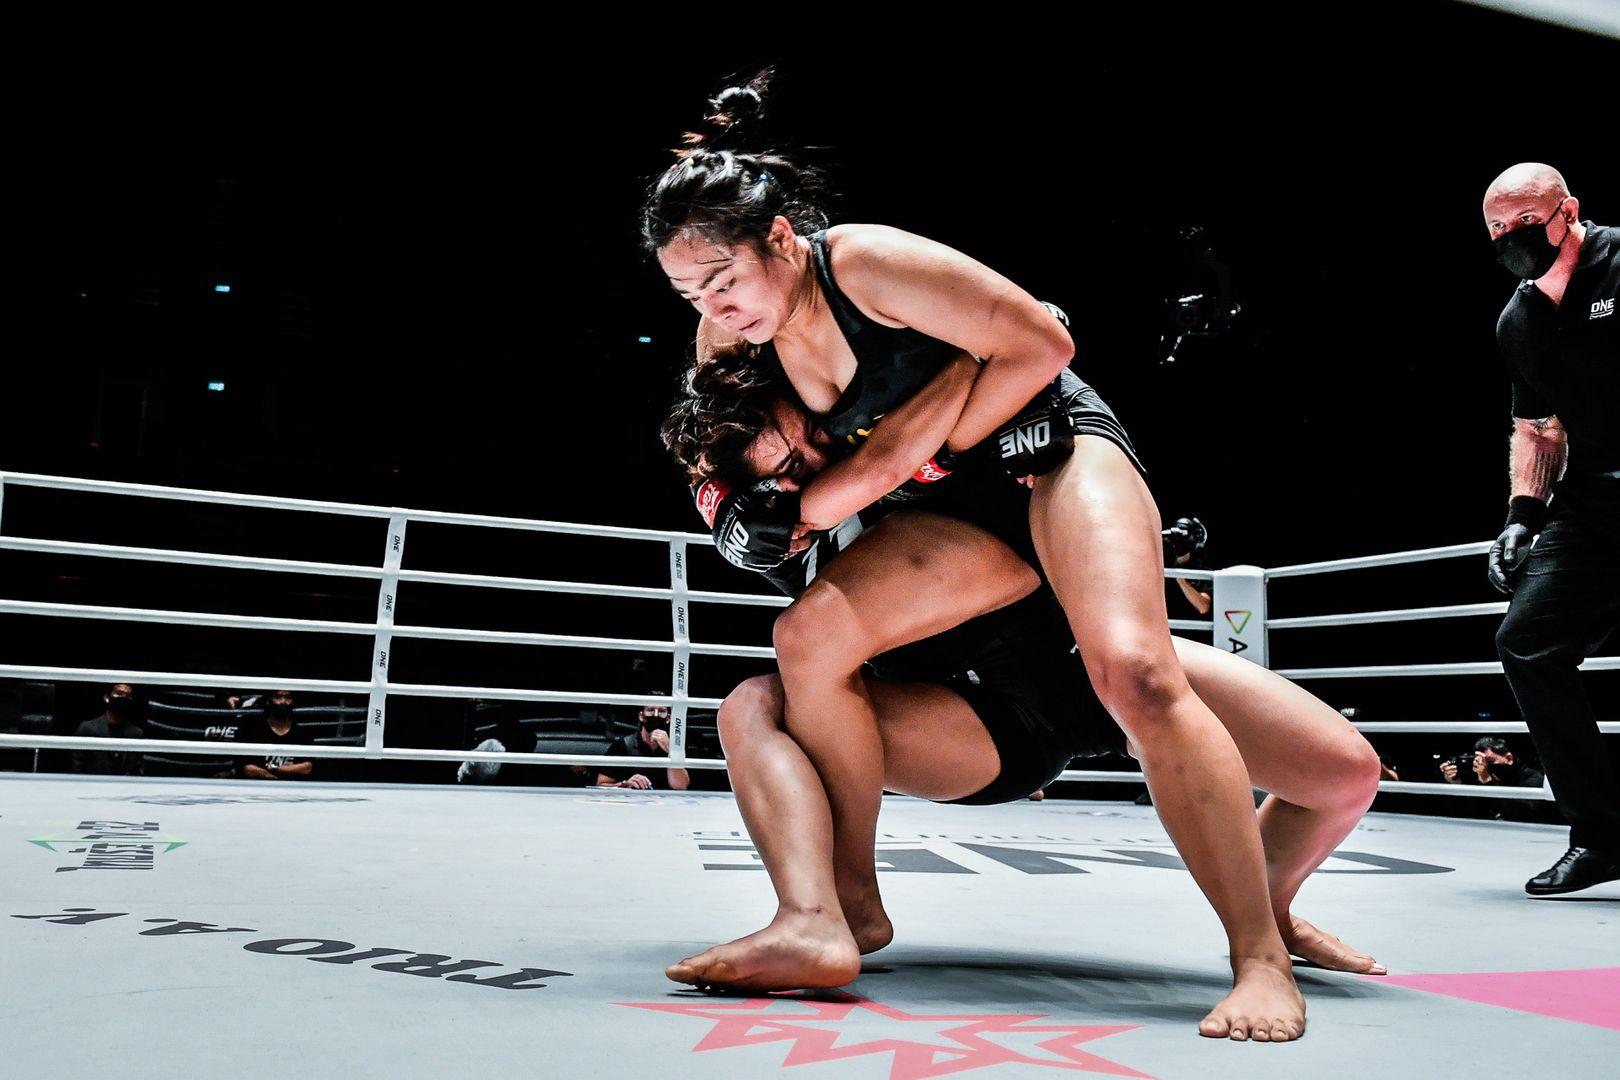 Srisen attempting a headlock against Rika ishige